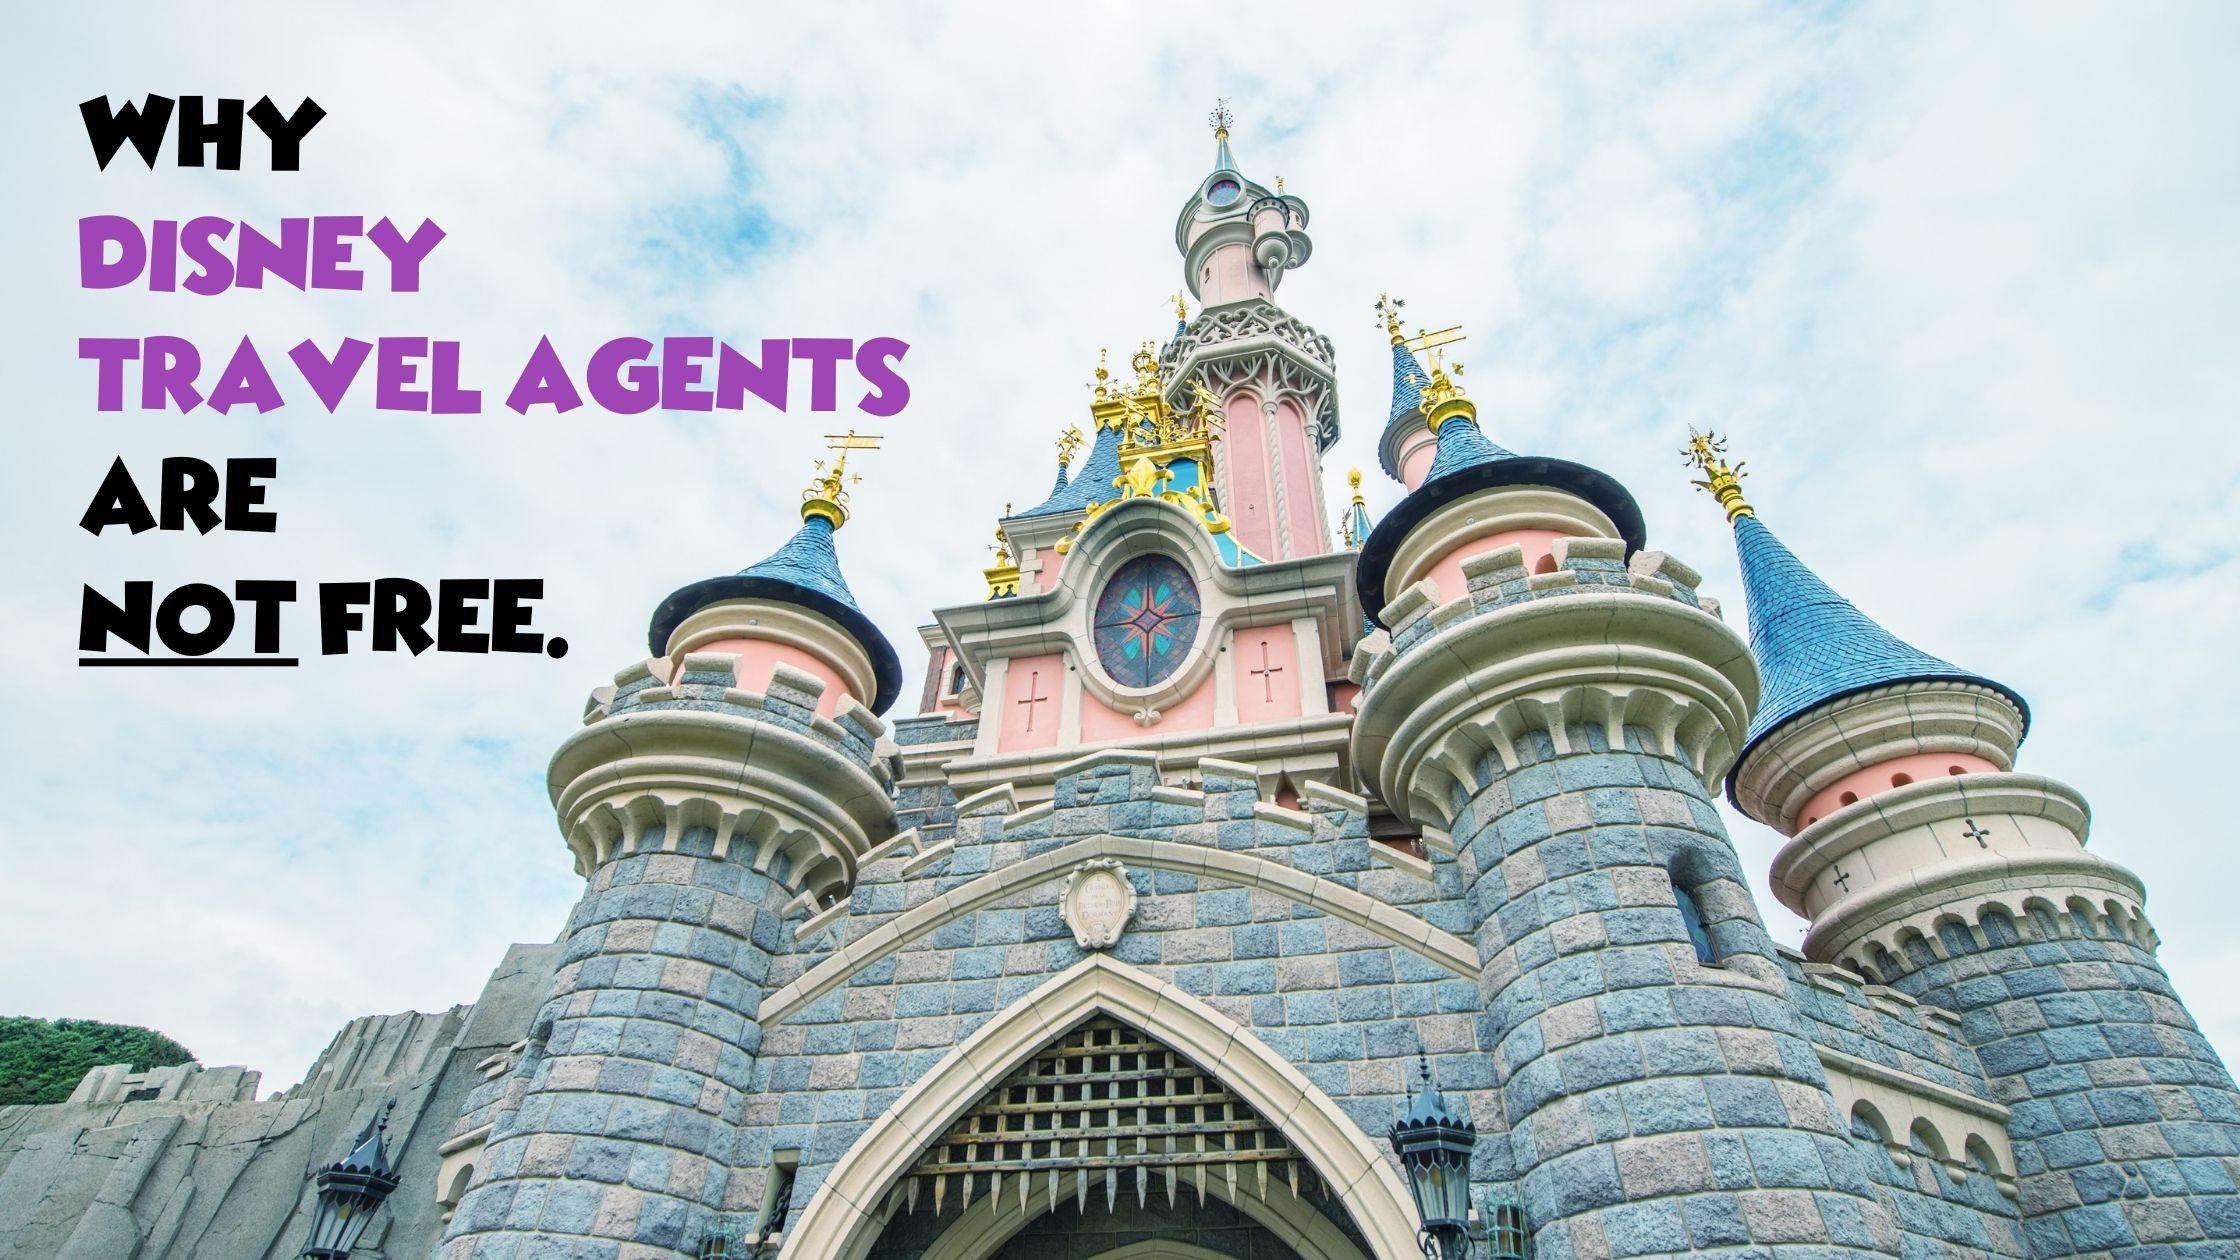 are disney travel agents free